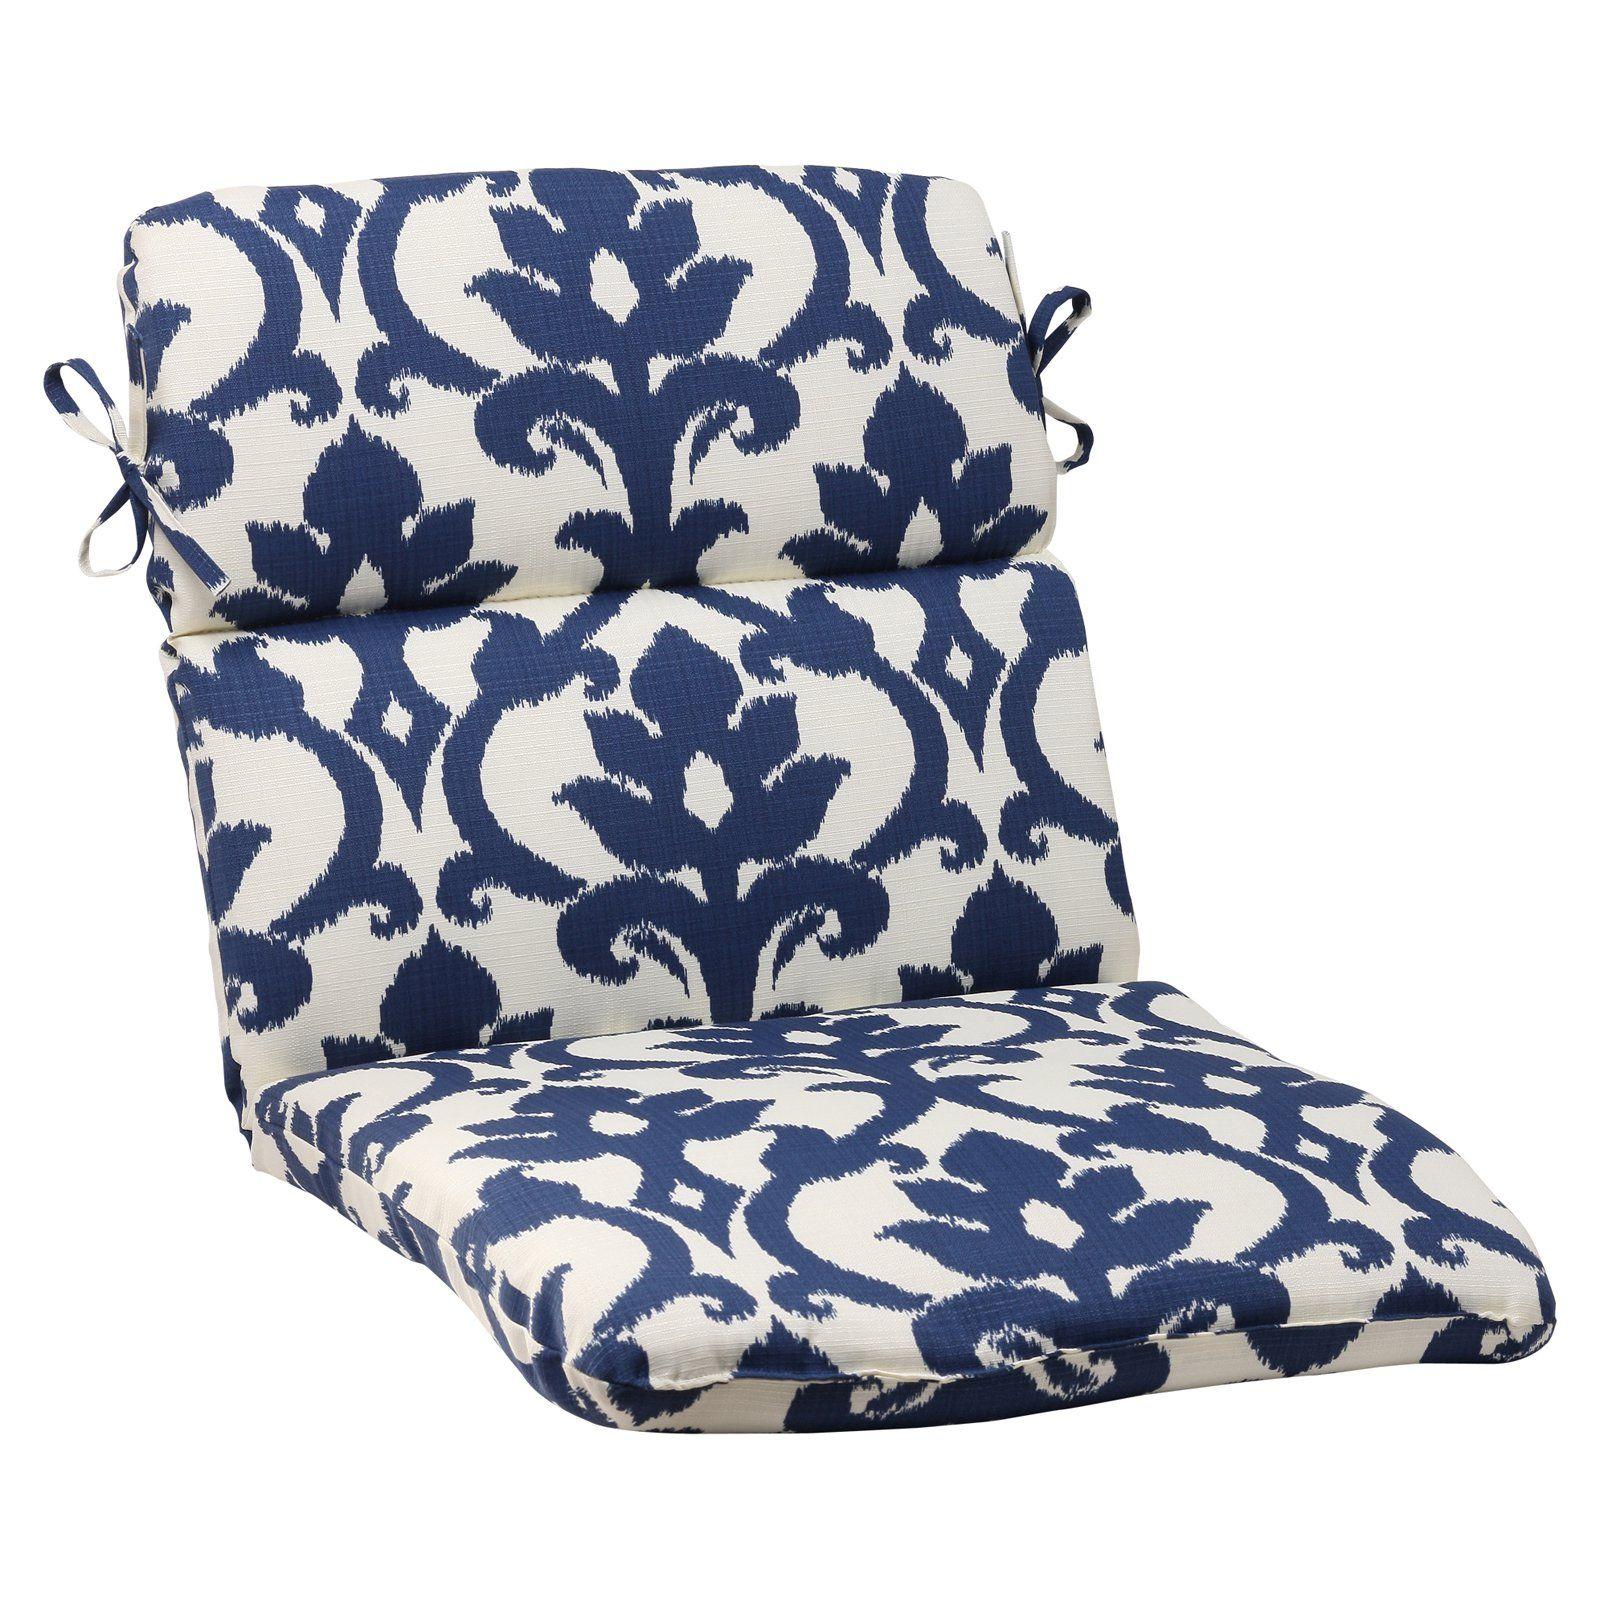 Decorative Pillows Home Navy Pillow Perfect Indoor Outdoor Bosco Bench Cushion